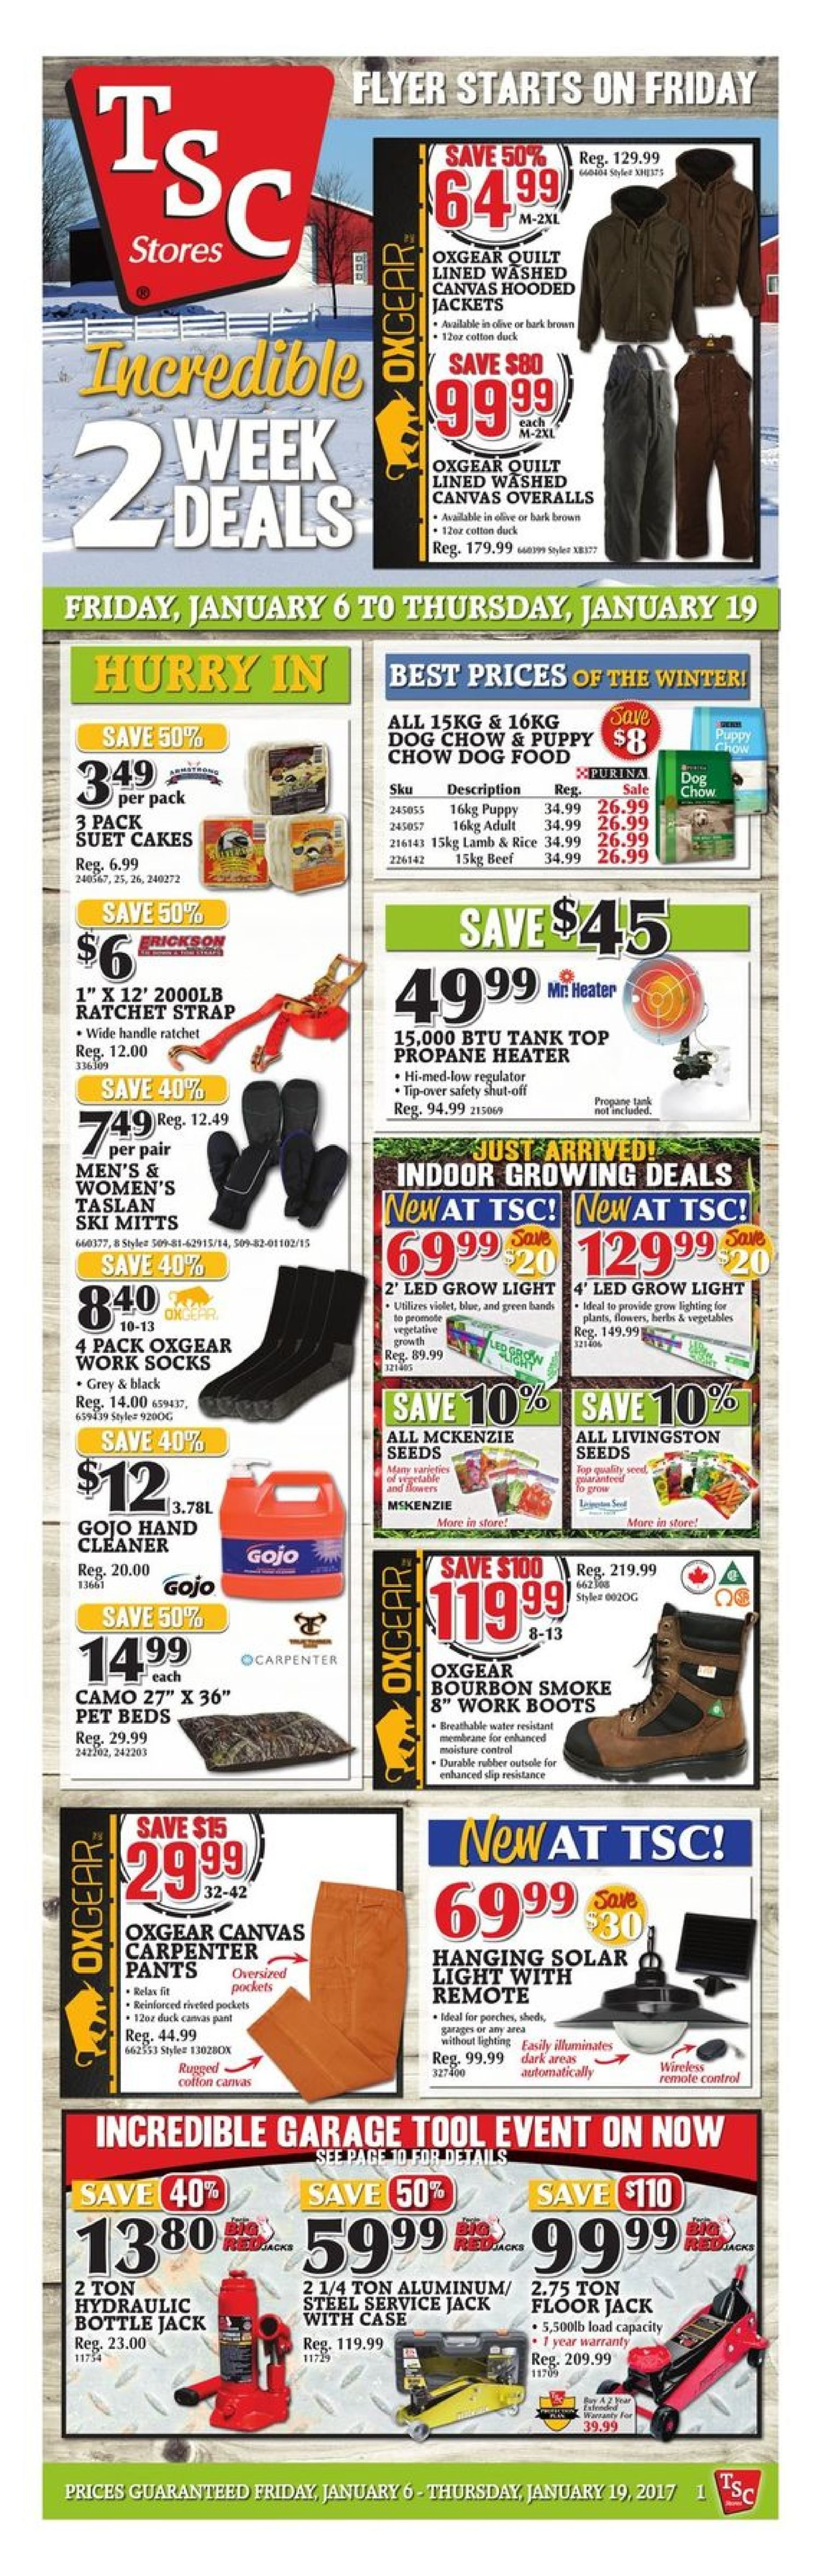 Tsc Stores Weekly Flyer 2 Weeks Of Savings Jan 6 19 Wiring For Front Component Speakersimg13661jpg